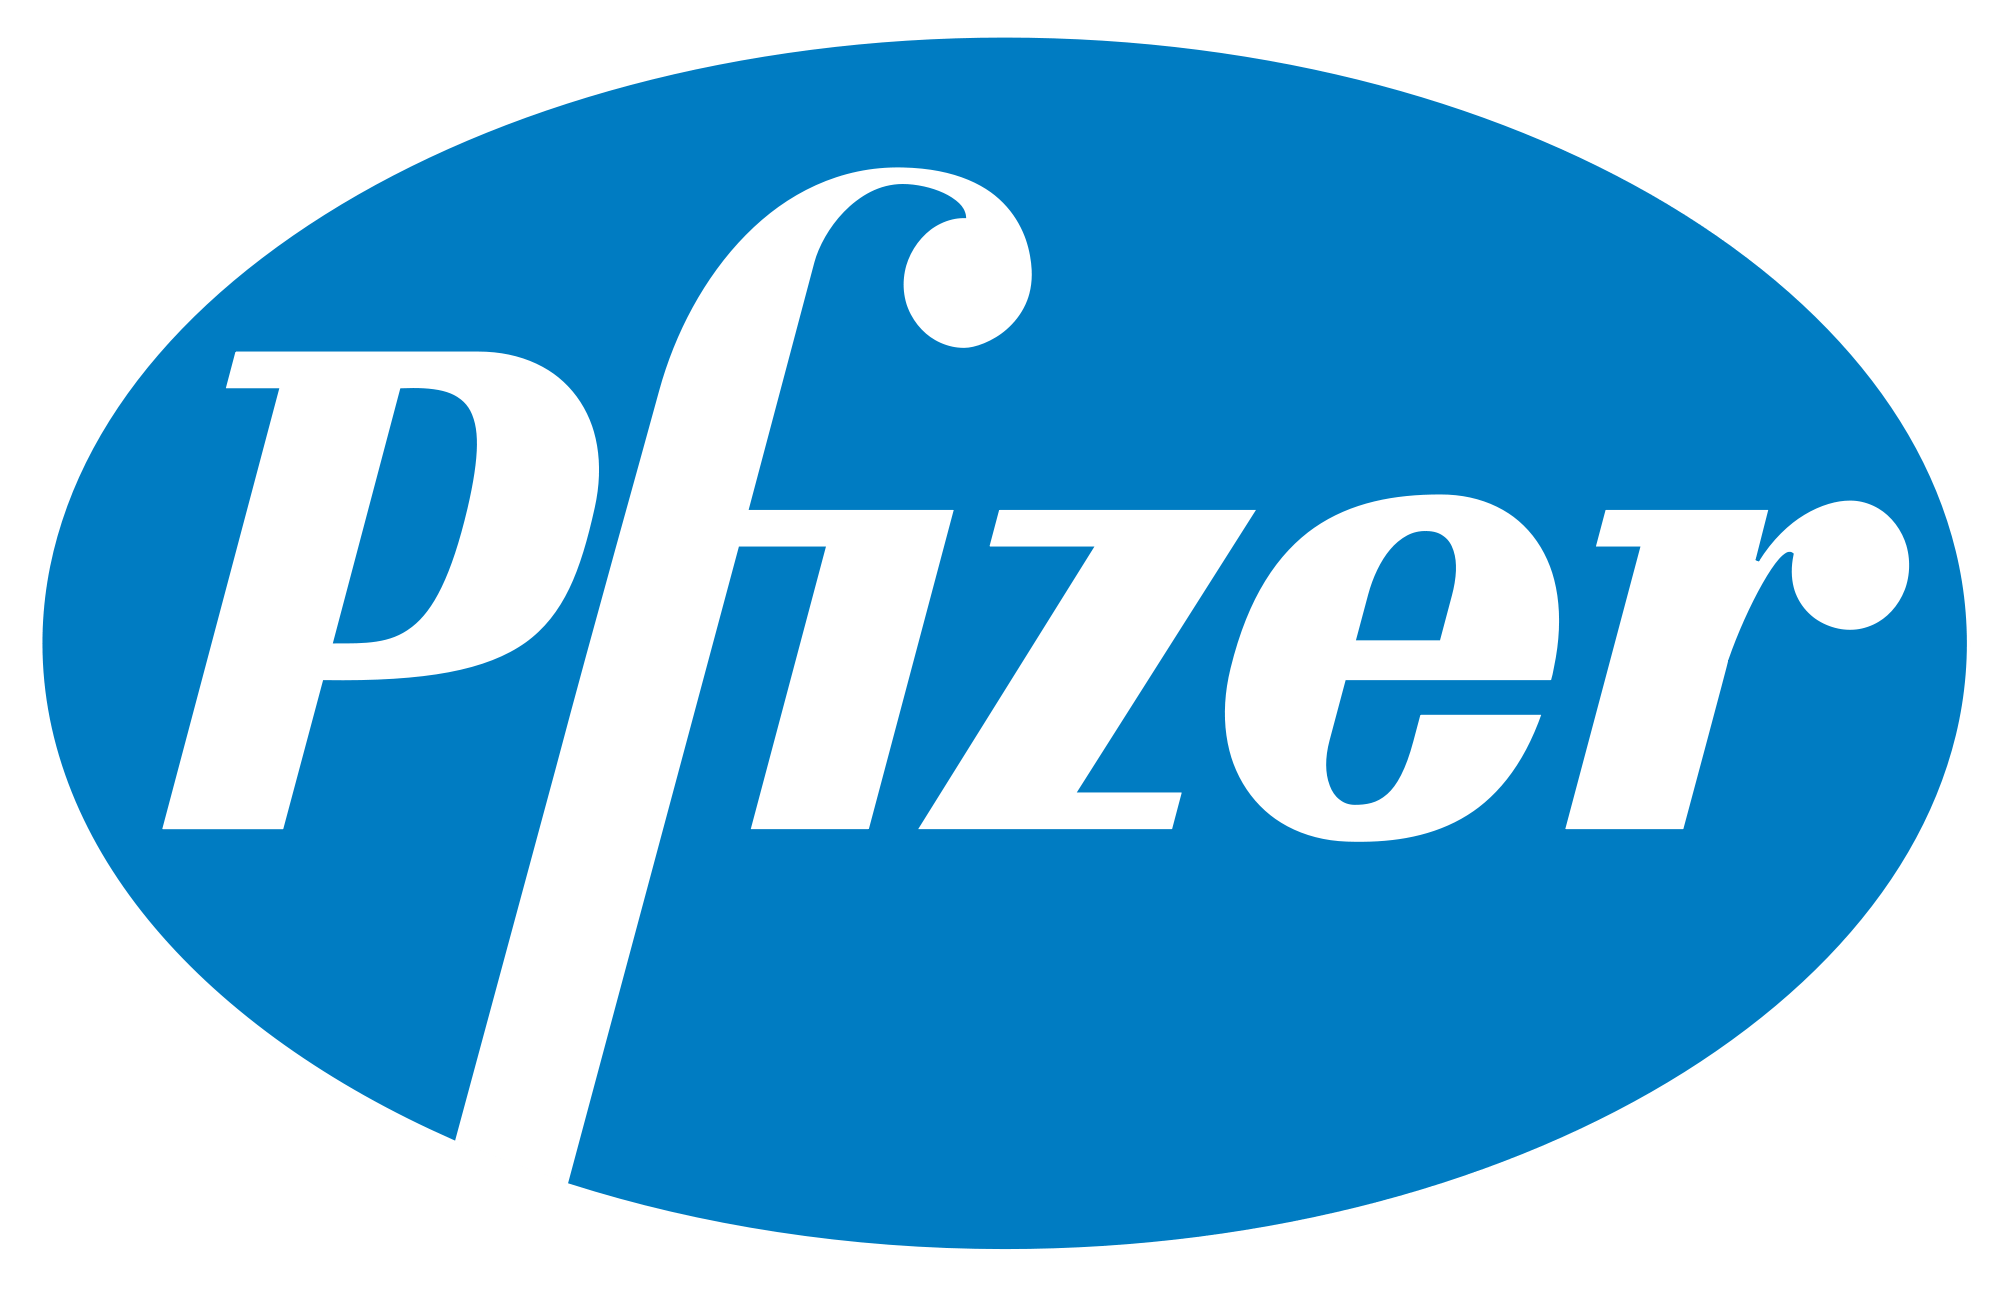 Pfizer Nigeria